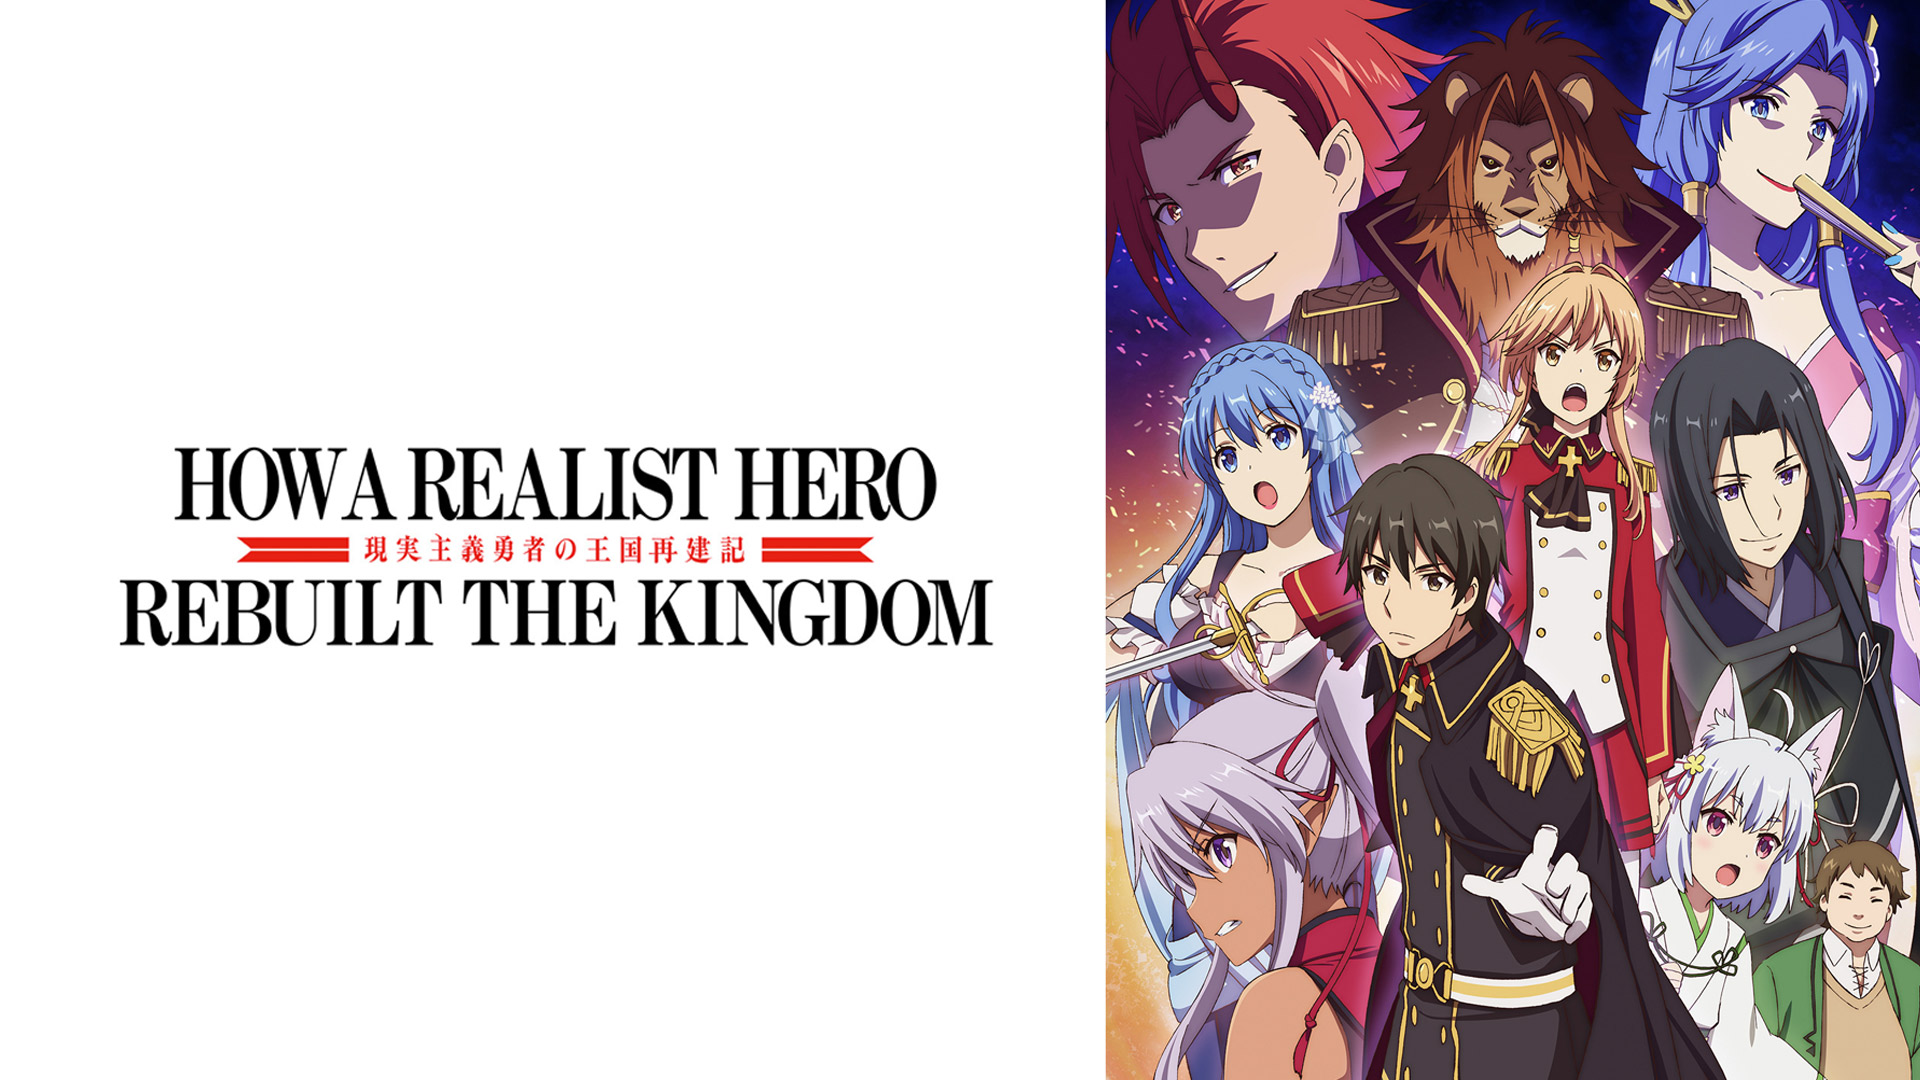 How a Realist Hero Rebuilt the Kingdom (Original Japanese Version)